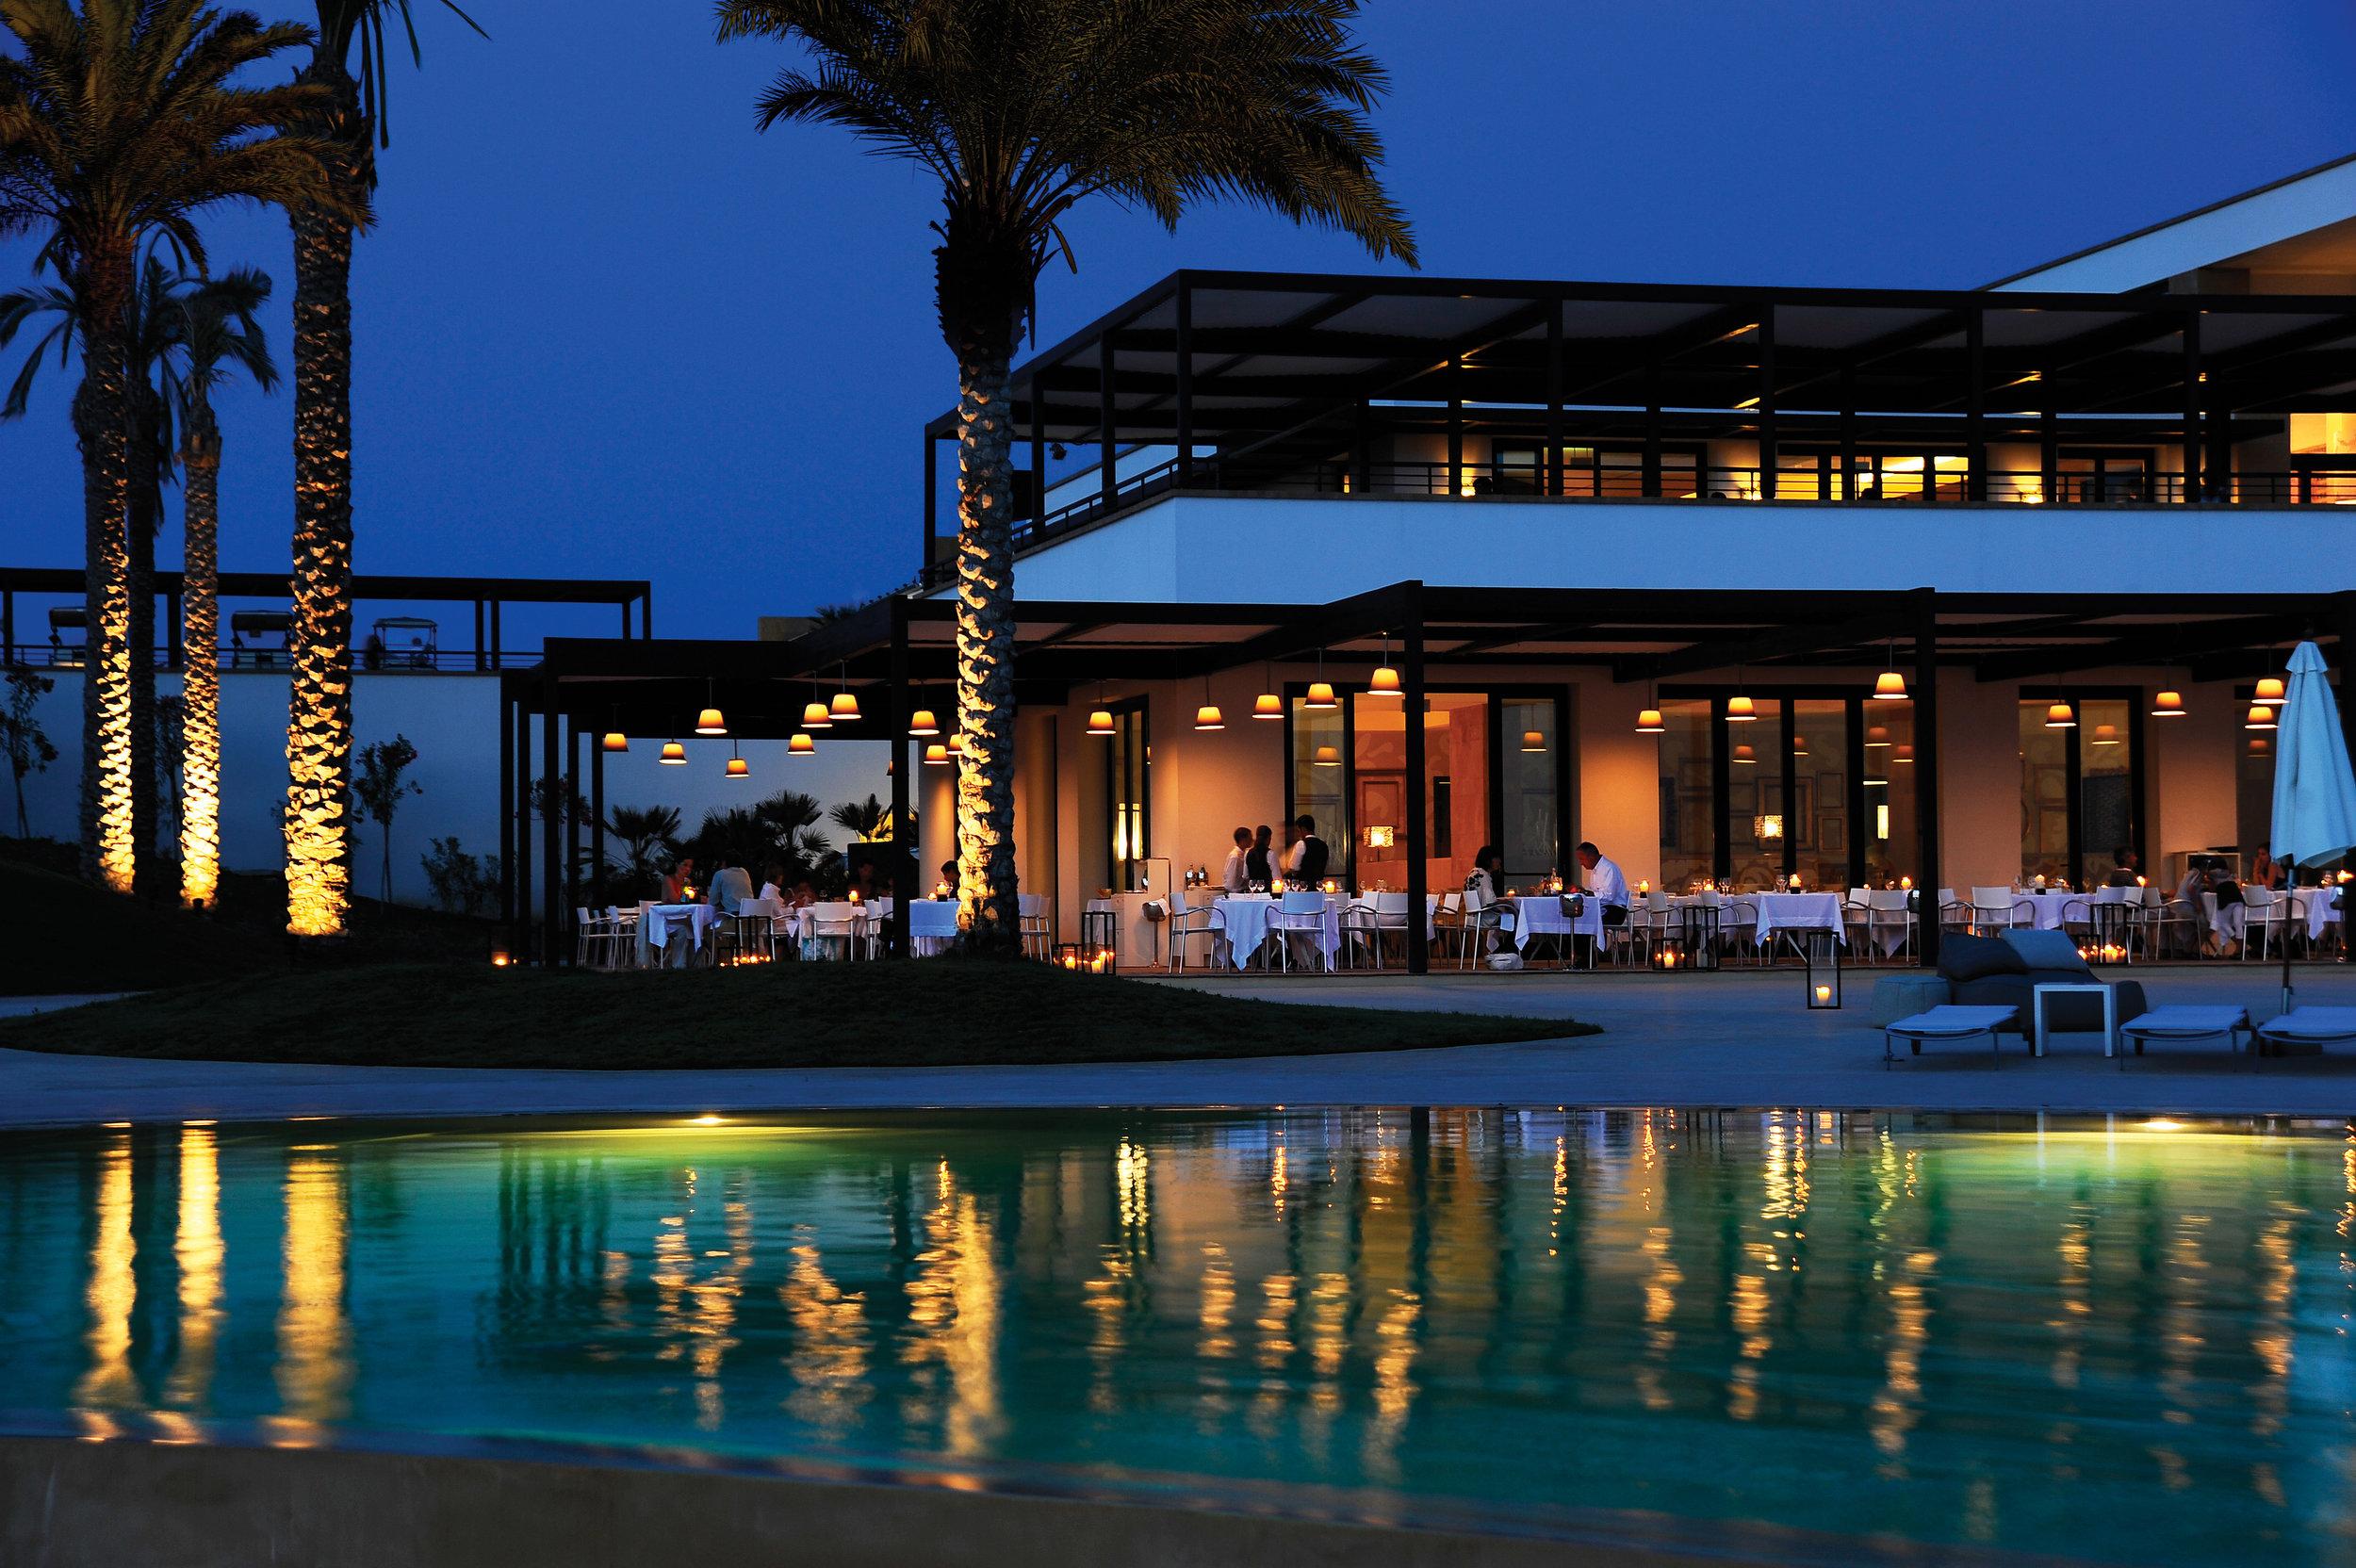 43 Verdura Golf & Spa Resort - La Zagara 319_RT RP Aug 09.jpg